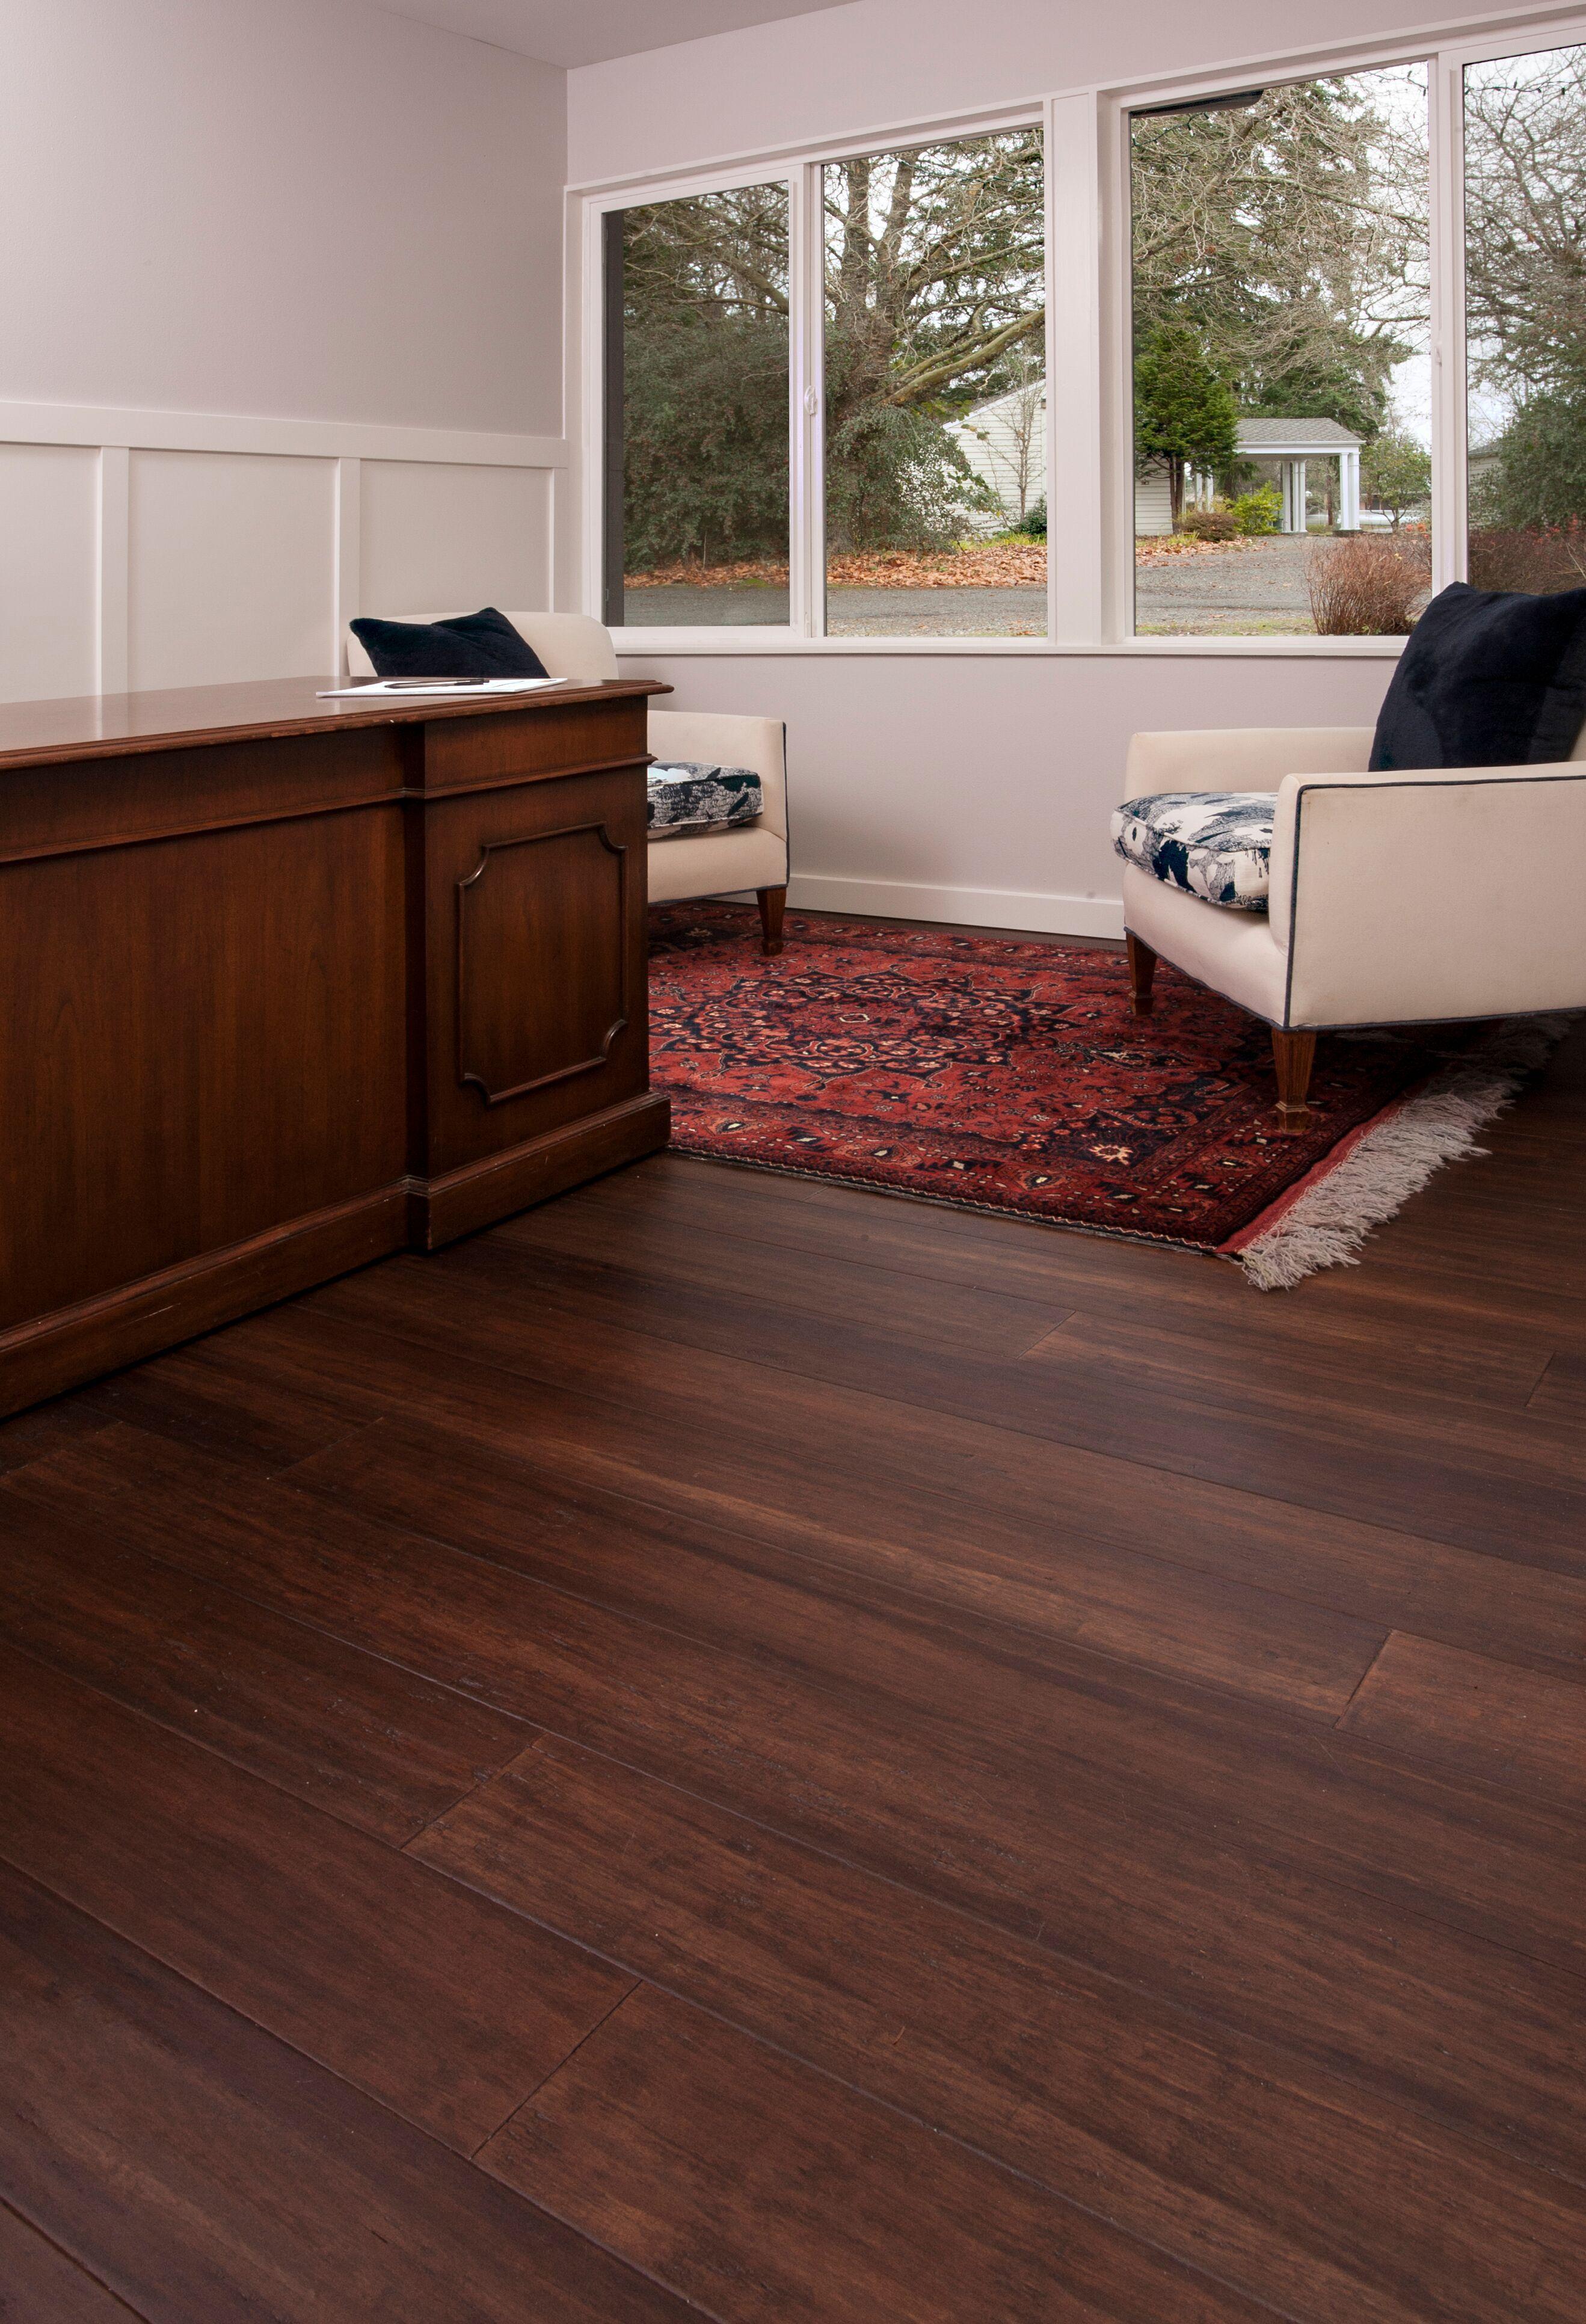 Engineered Strand Trinity Bamboo Warm Brown Color In 2020 Strand Bamboo Flooring Flooring Wide Plank Flooring